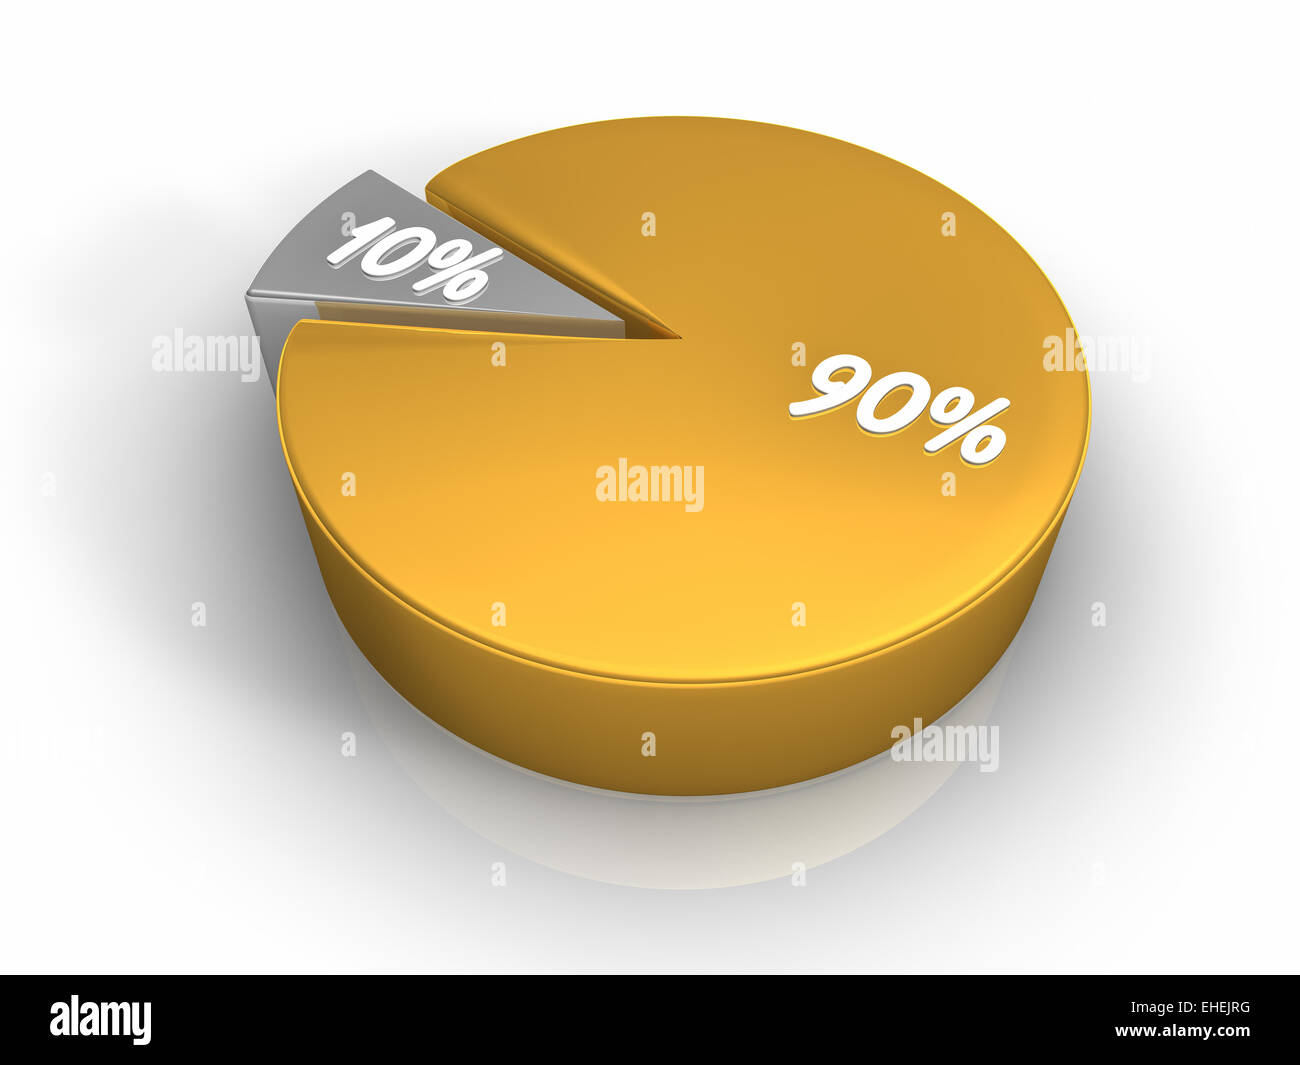 Pie chart 90 10 percent stock photo 79612724 alamy pie chart 90 10 percent nvjuhfo Image collections